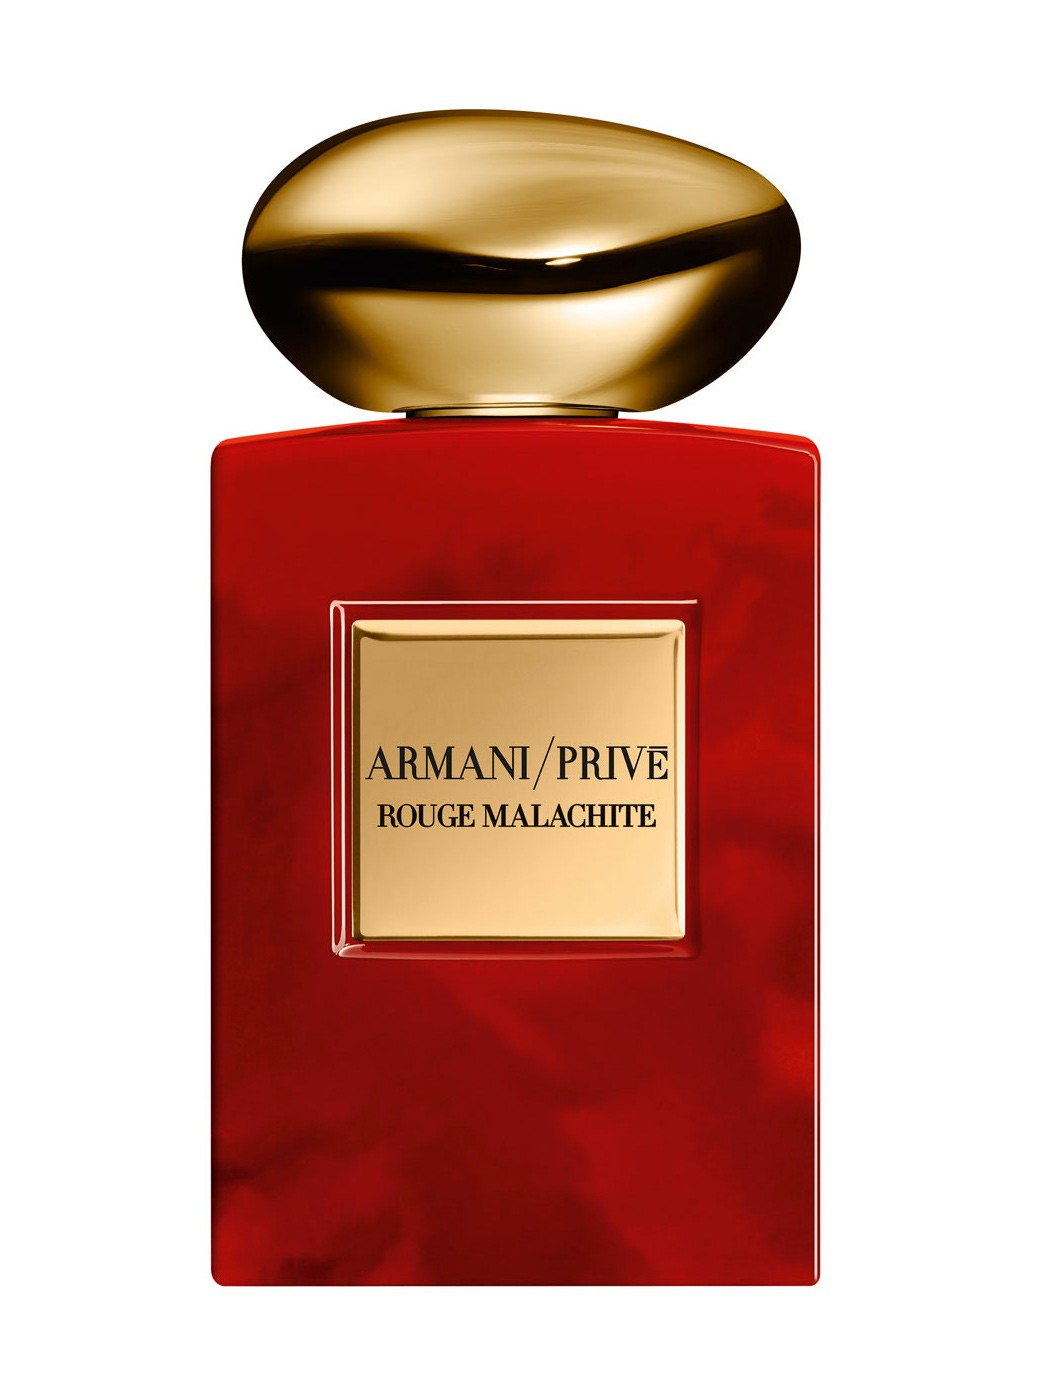 Armani Rouge Malachite L'Or De Russie аромат для мужчин и женщин